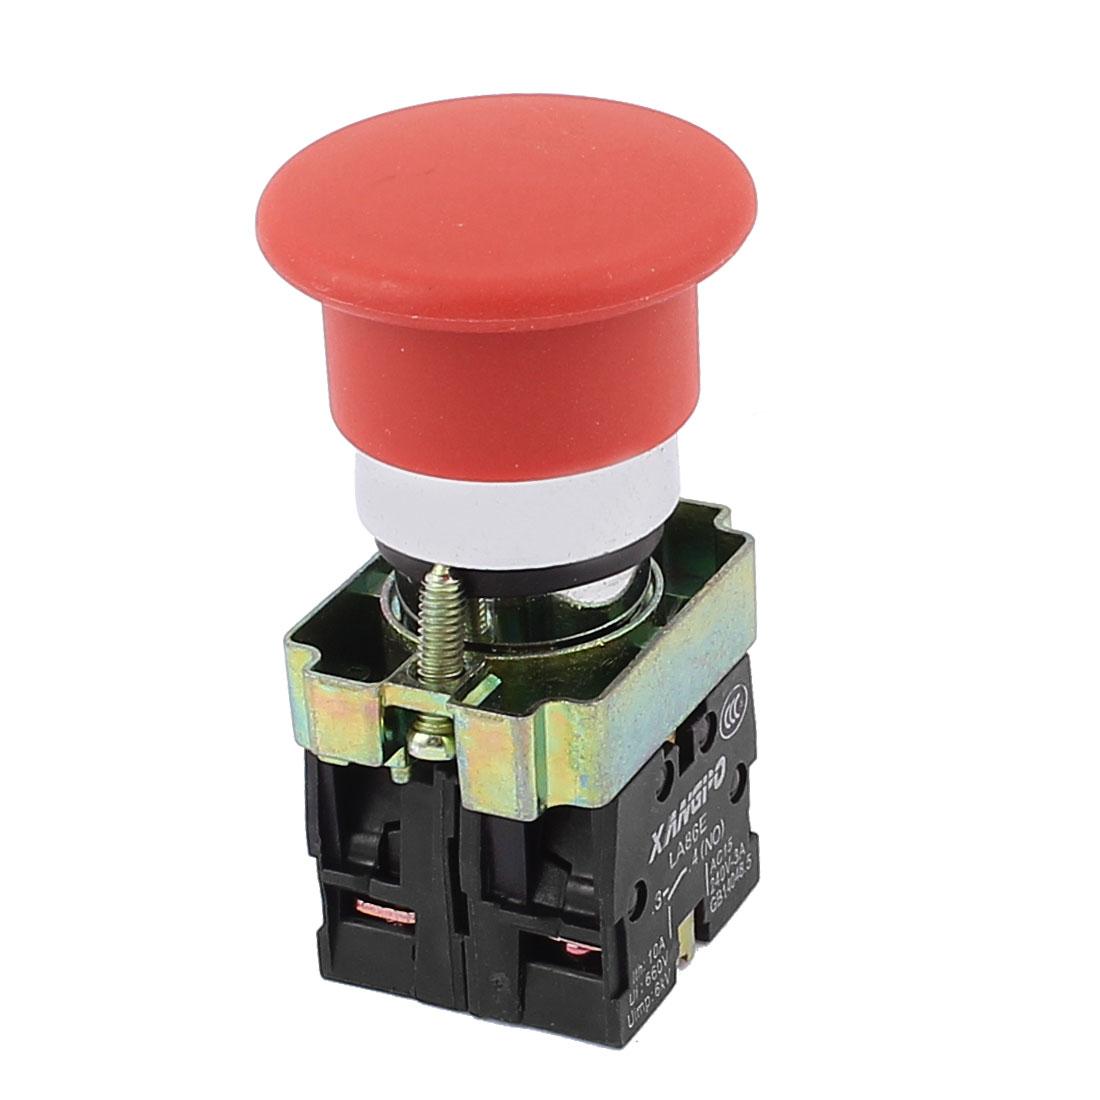 Red Mushroom Head 4-Terminal 1NC+1NO Emergency Push Botton Switch AC 660V 10A